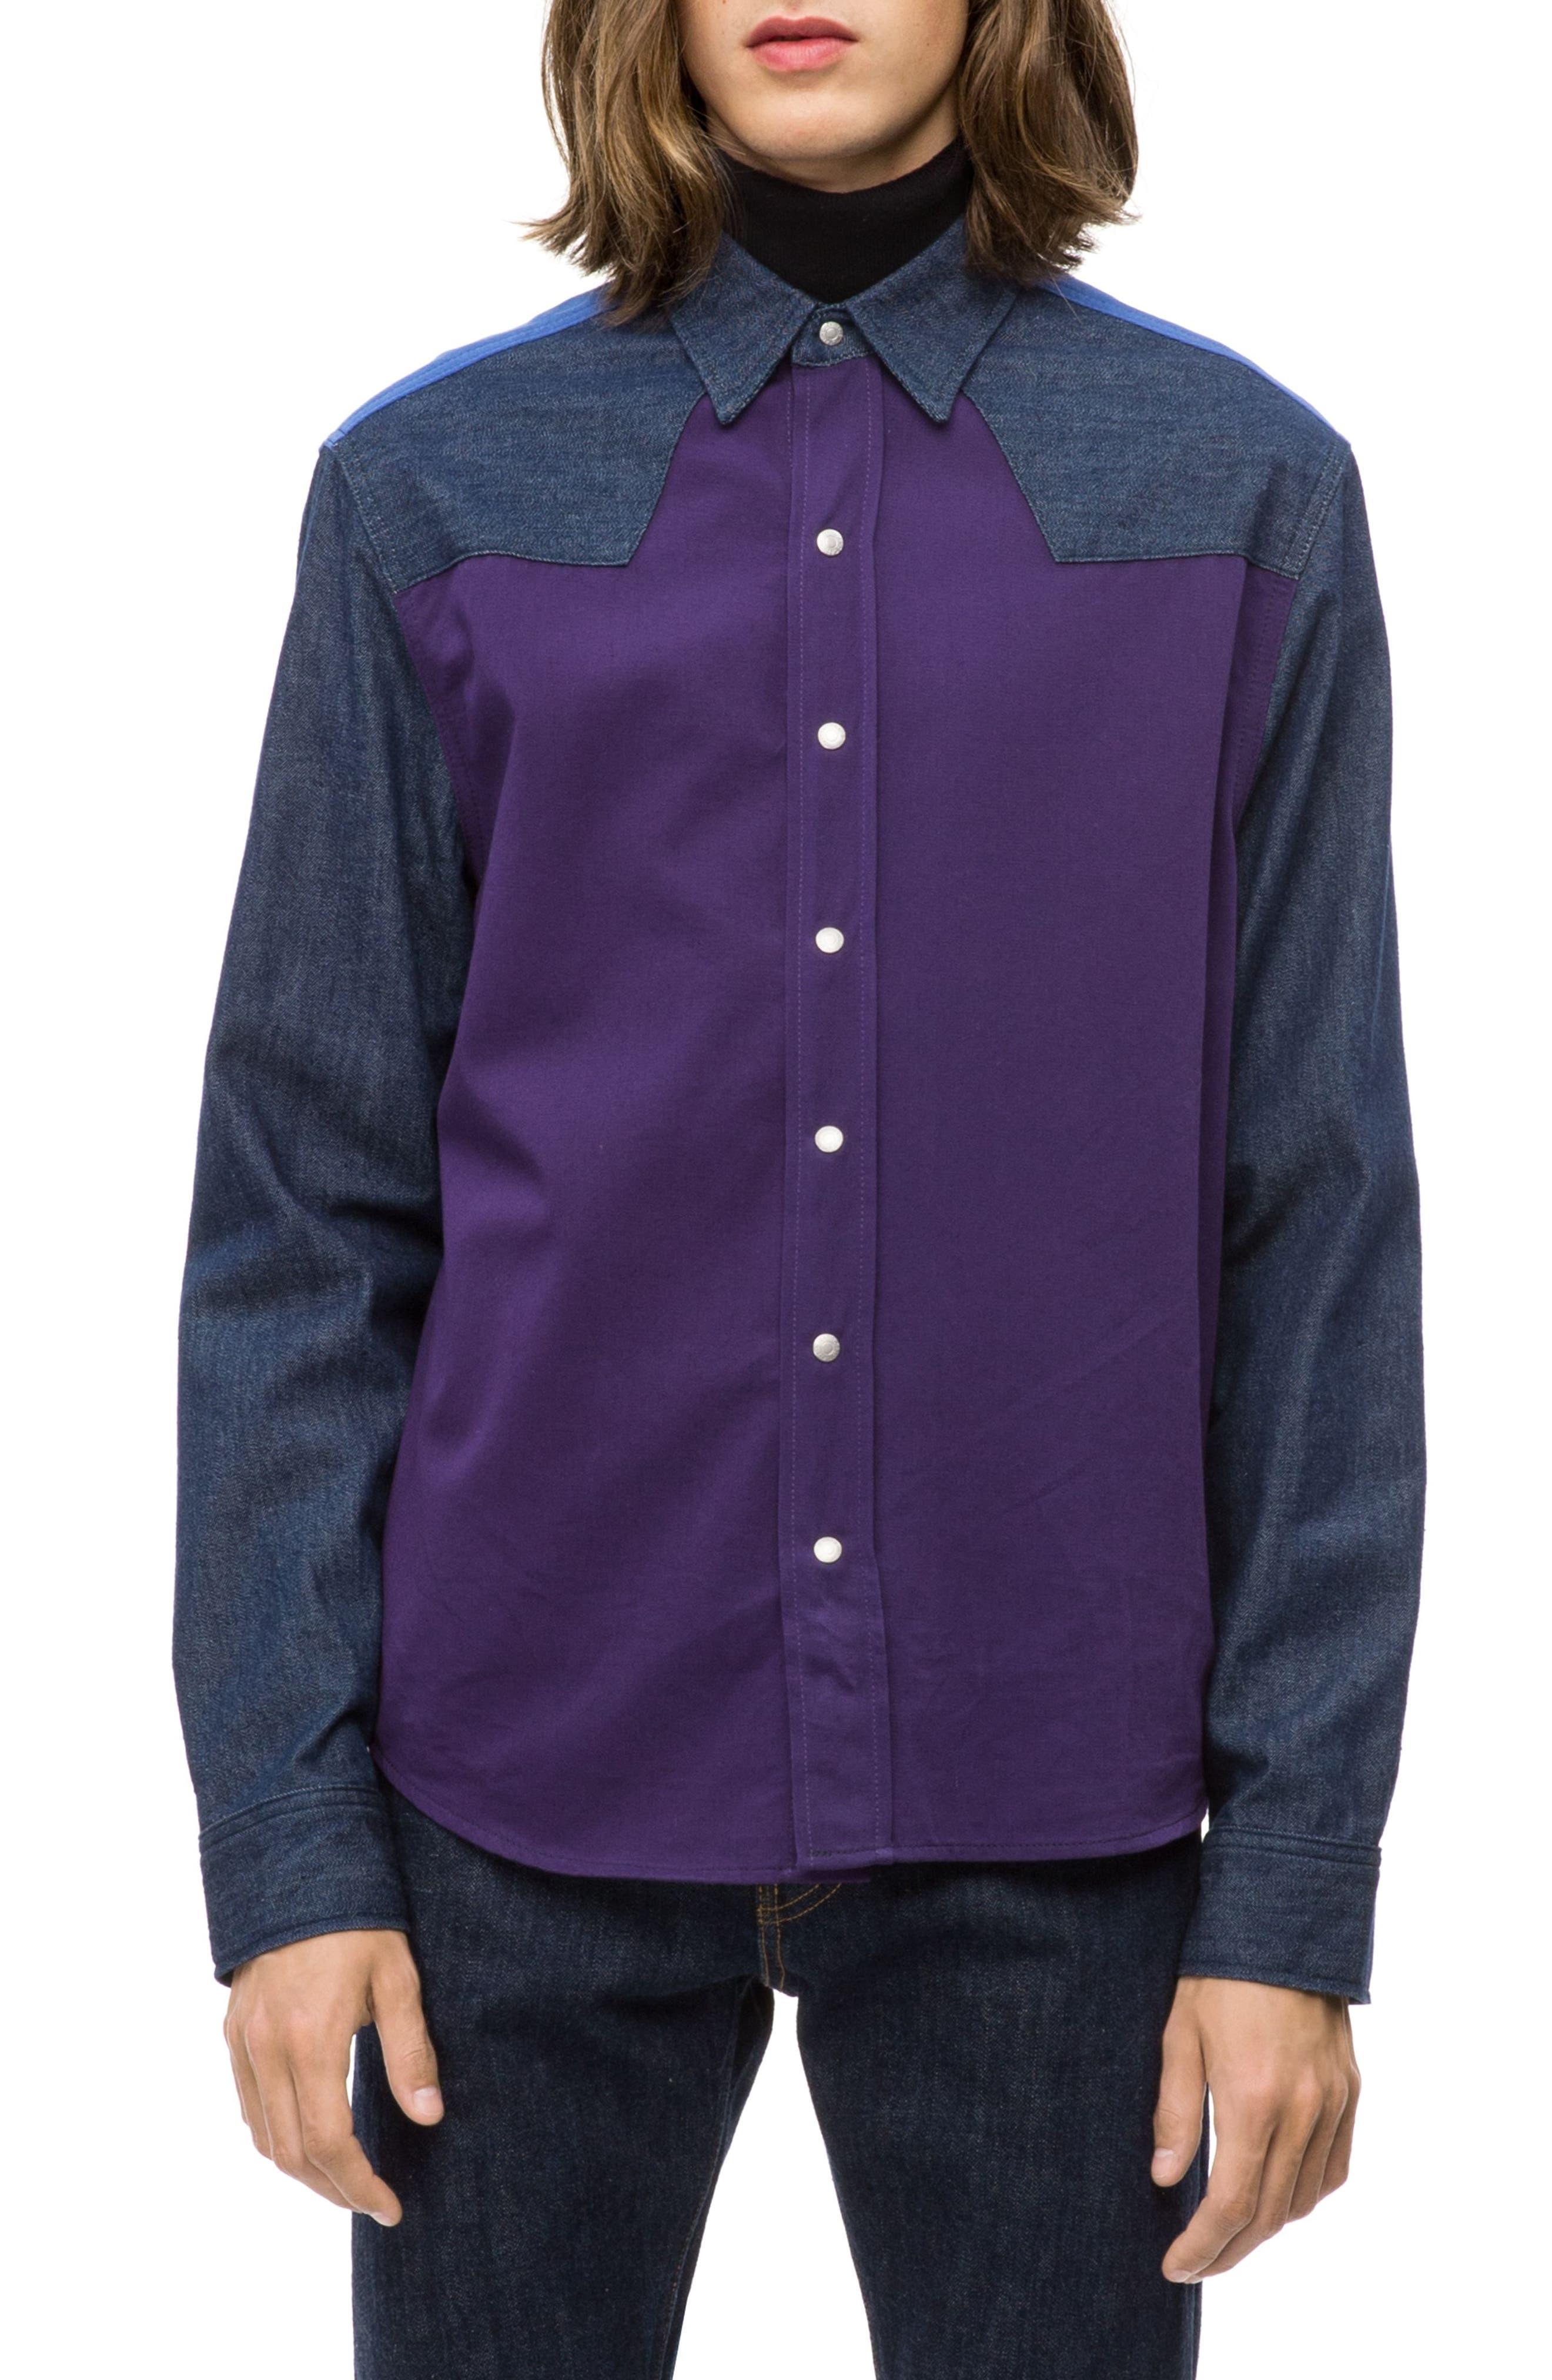 Calvin Klein Colorblock Western Shirt,                             Main thumbnail 1, color,                             OLIVIA RINSE